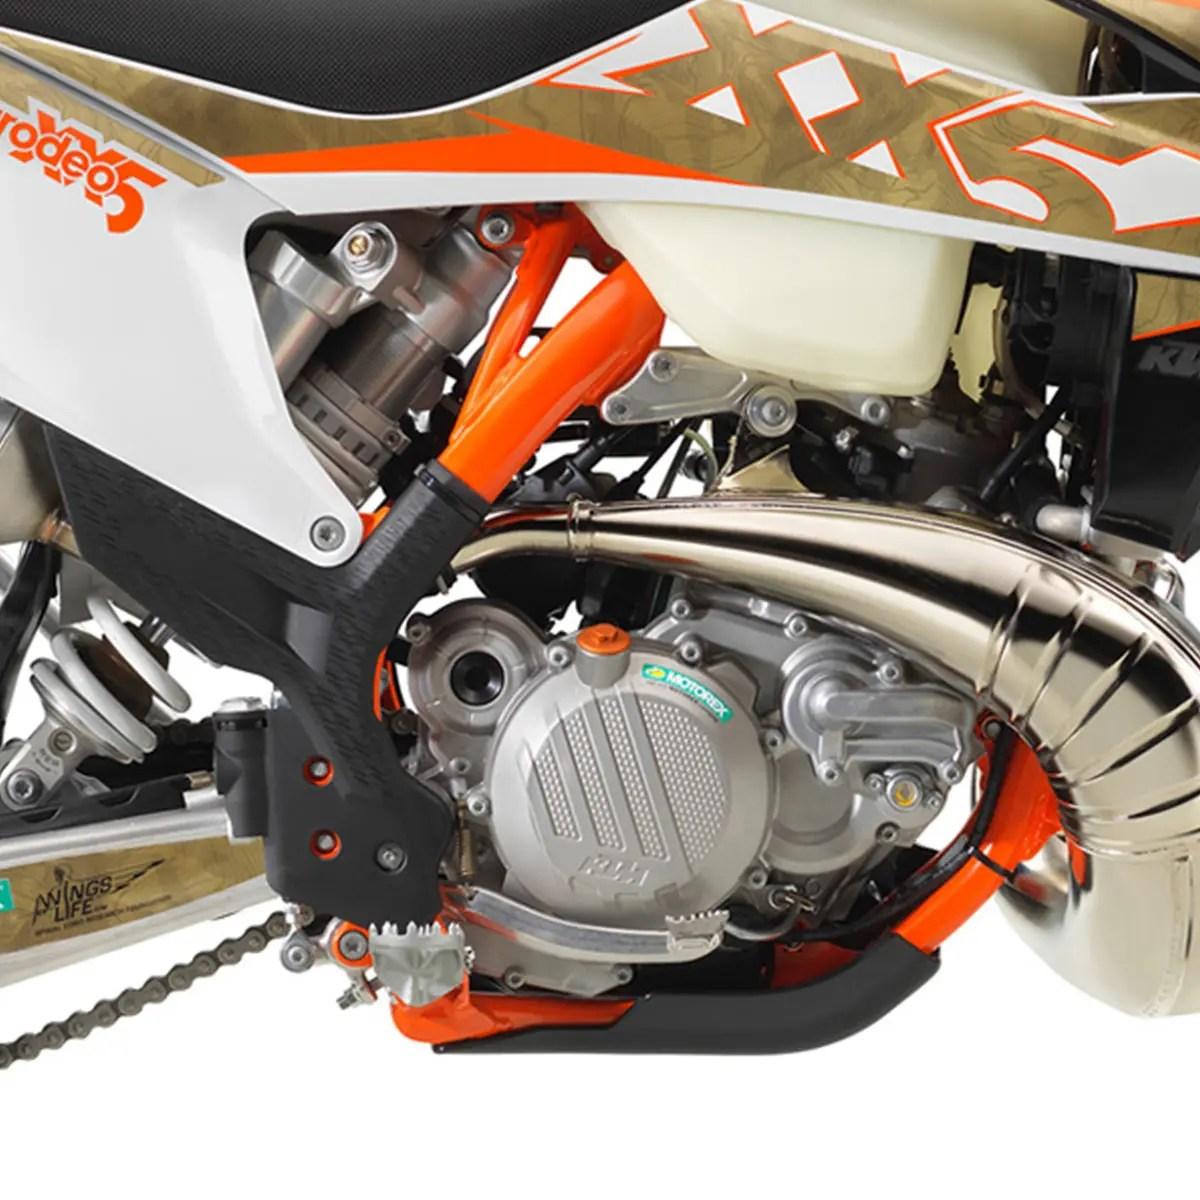 CADRE-KTM-300-EXC-TPI-ERZBERGRODEO-2020